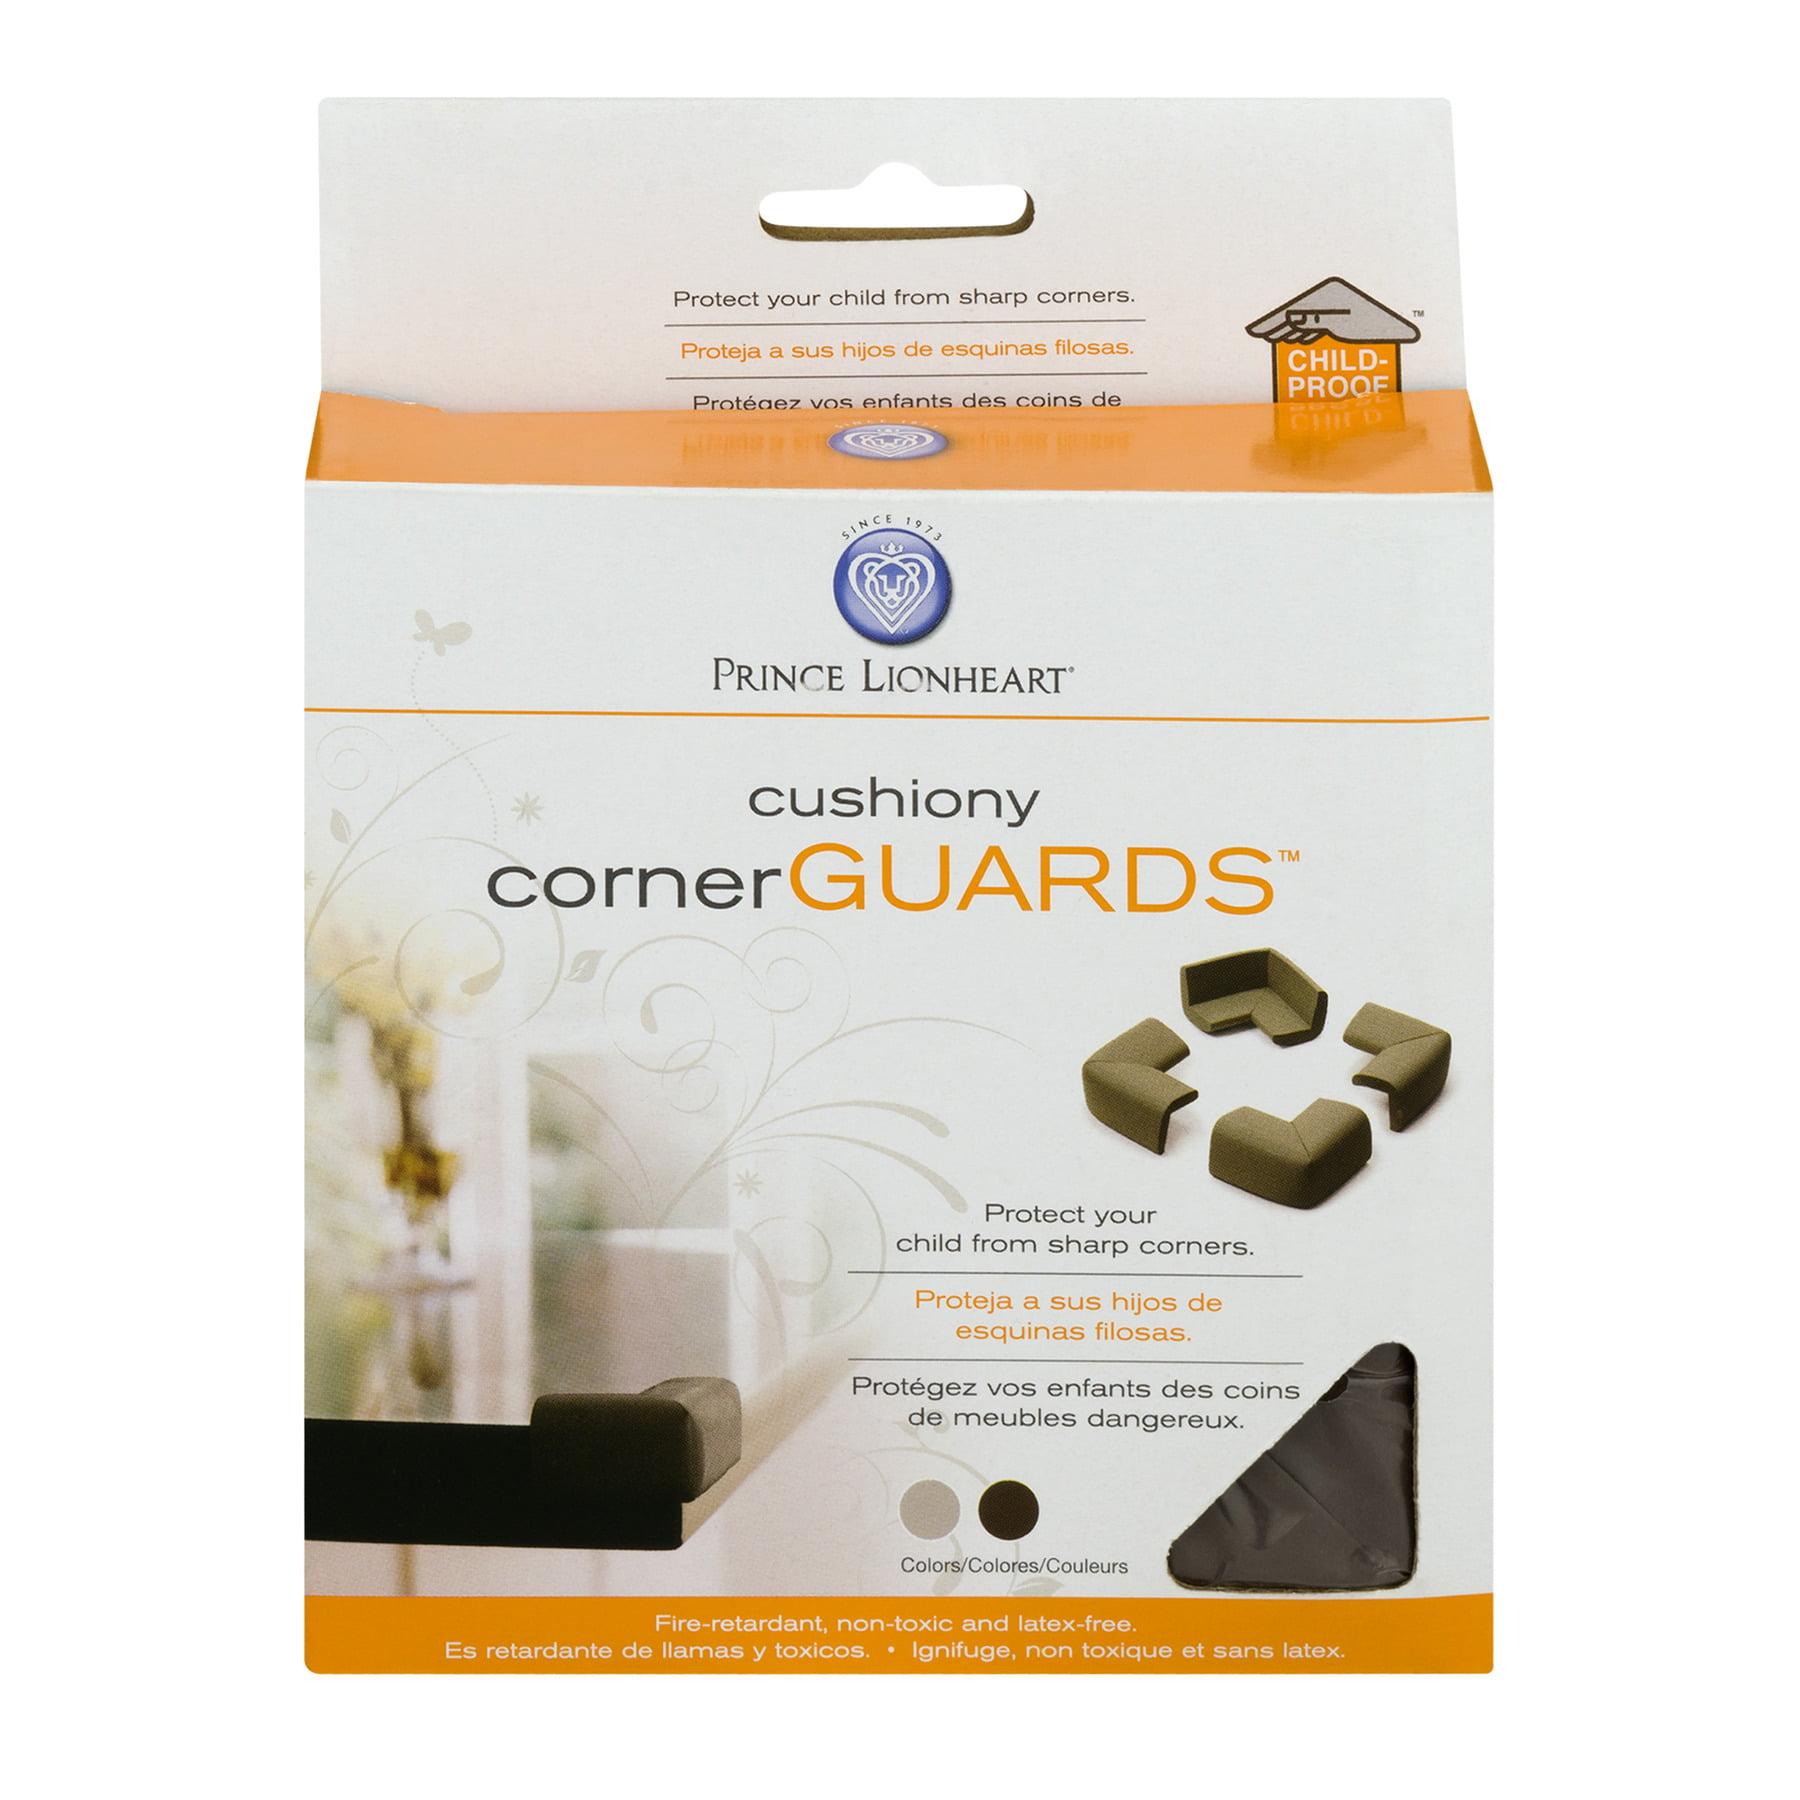 Prince Lionheart Cushiony Corner Guards, 4.0 PACK